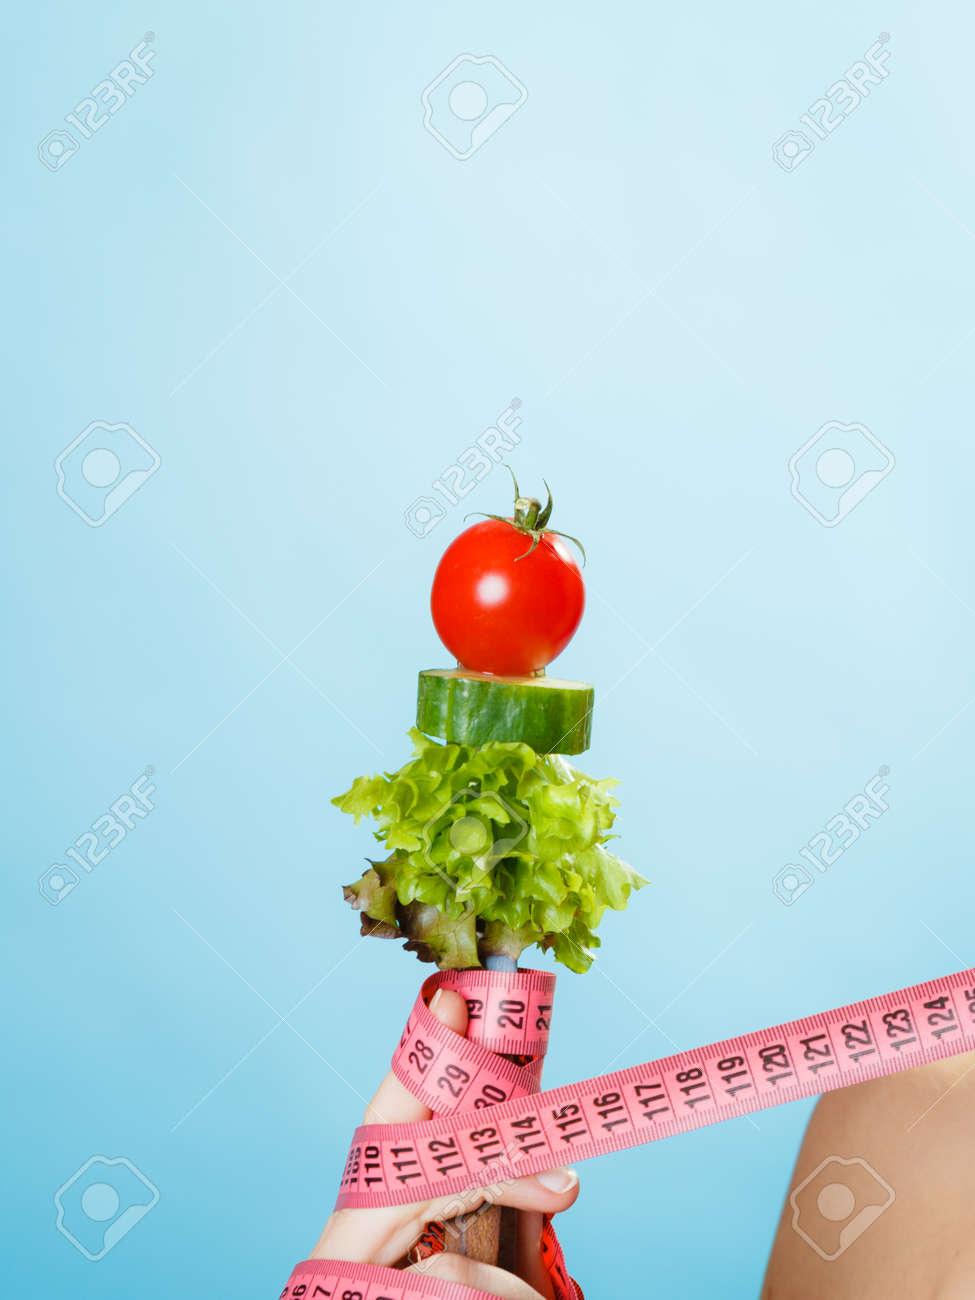 dieta vegetariana e perdita di peso